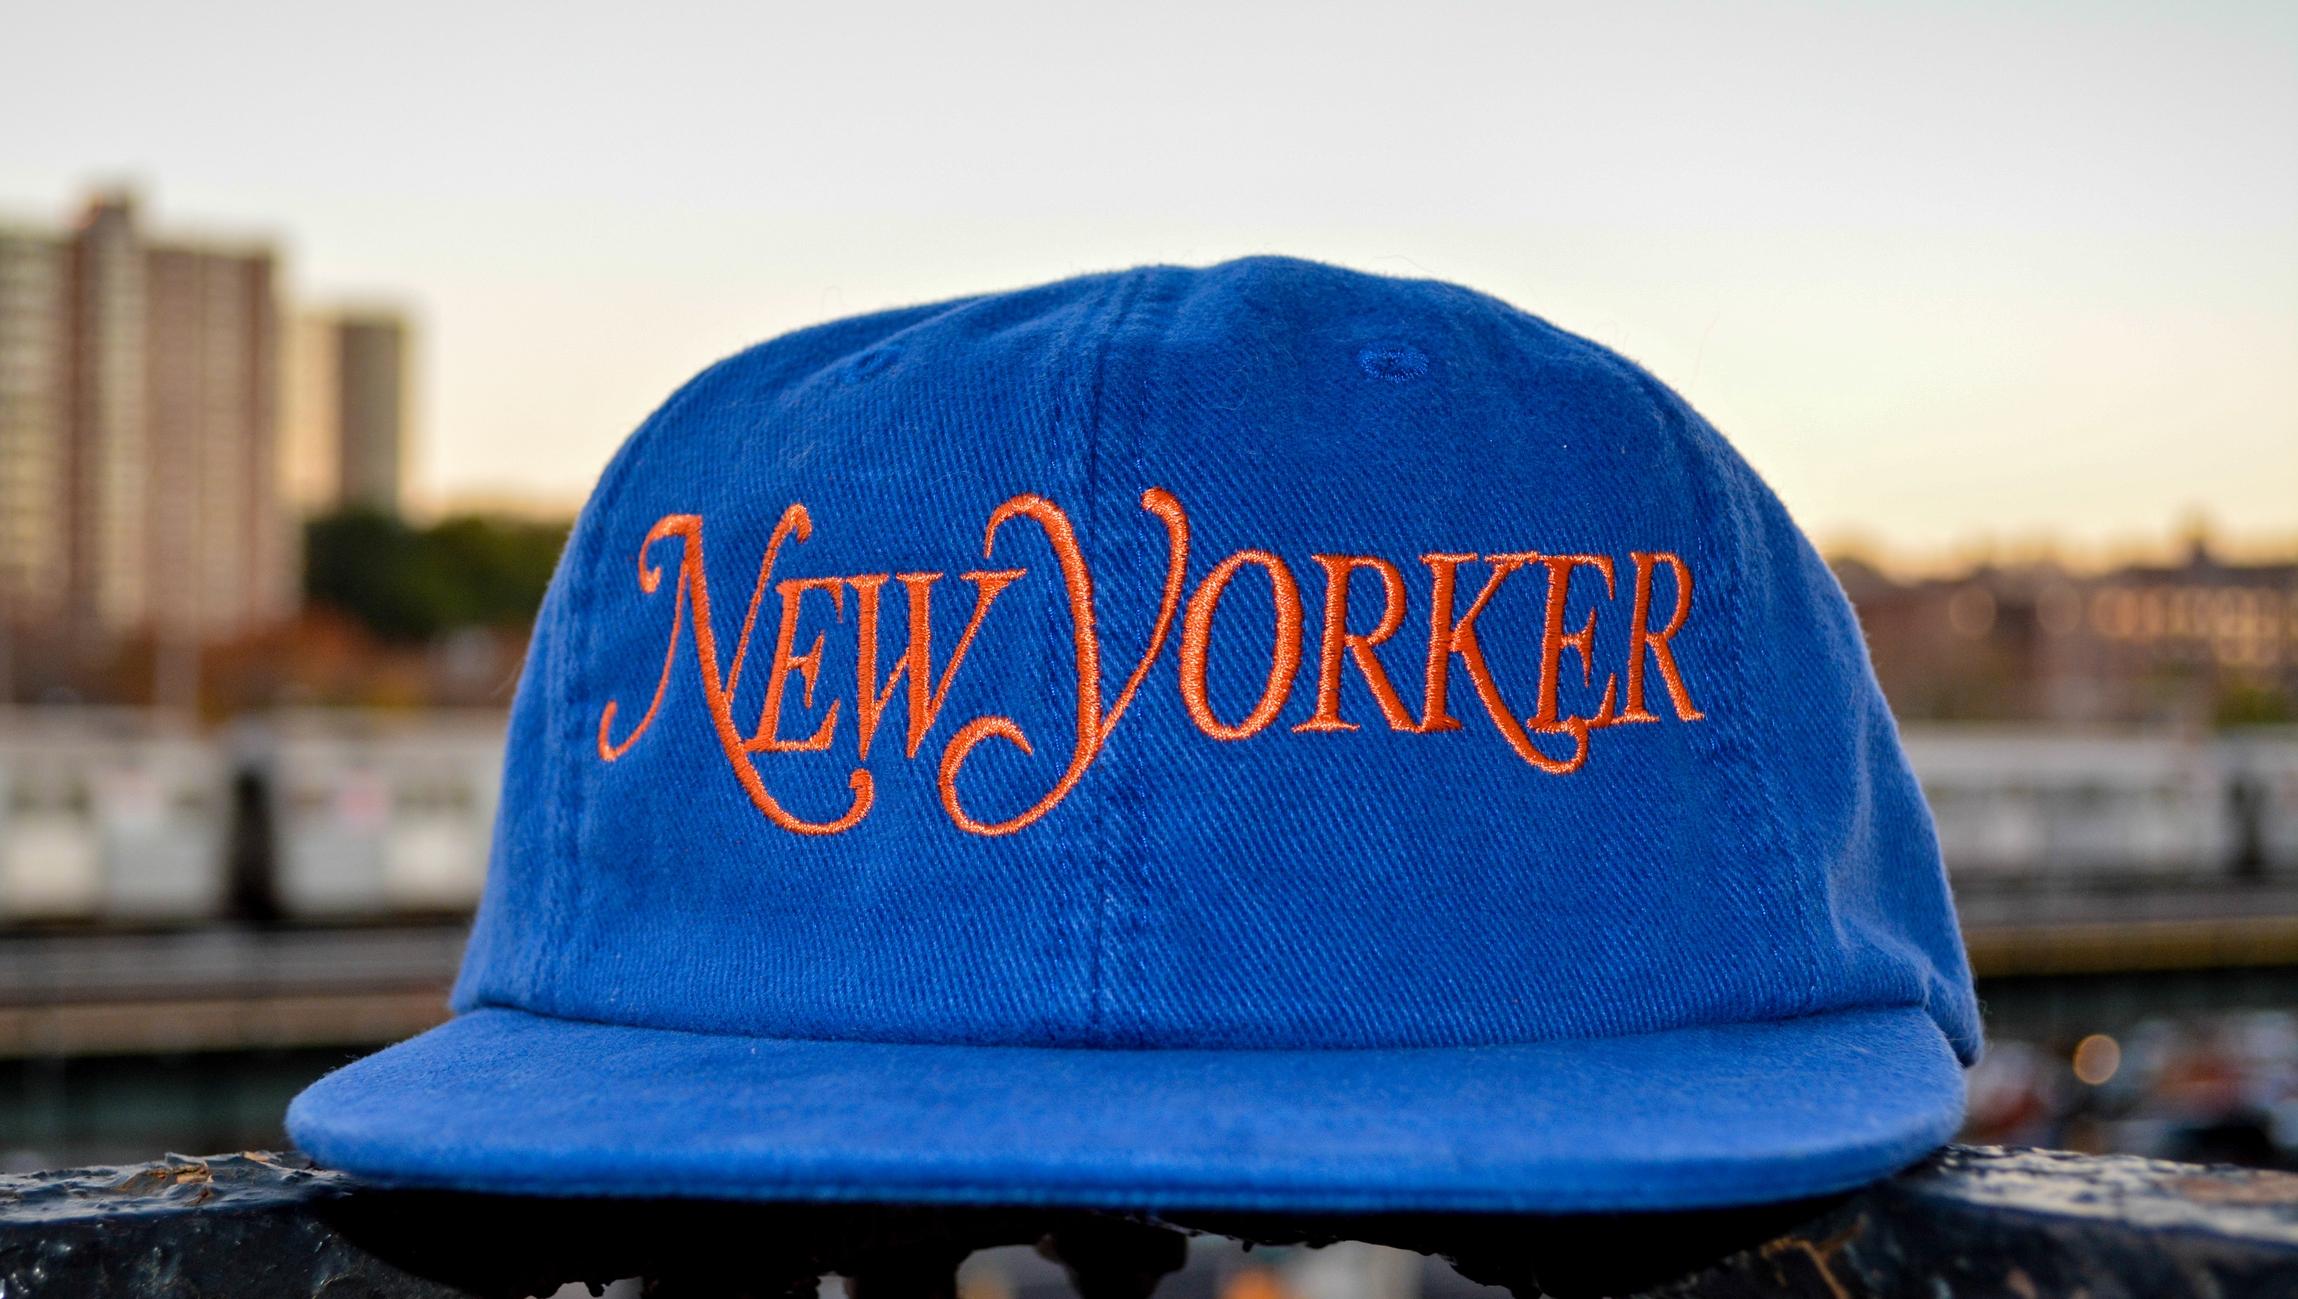 New Yorker baseball cap e5984c1007f